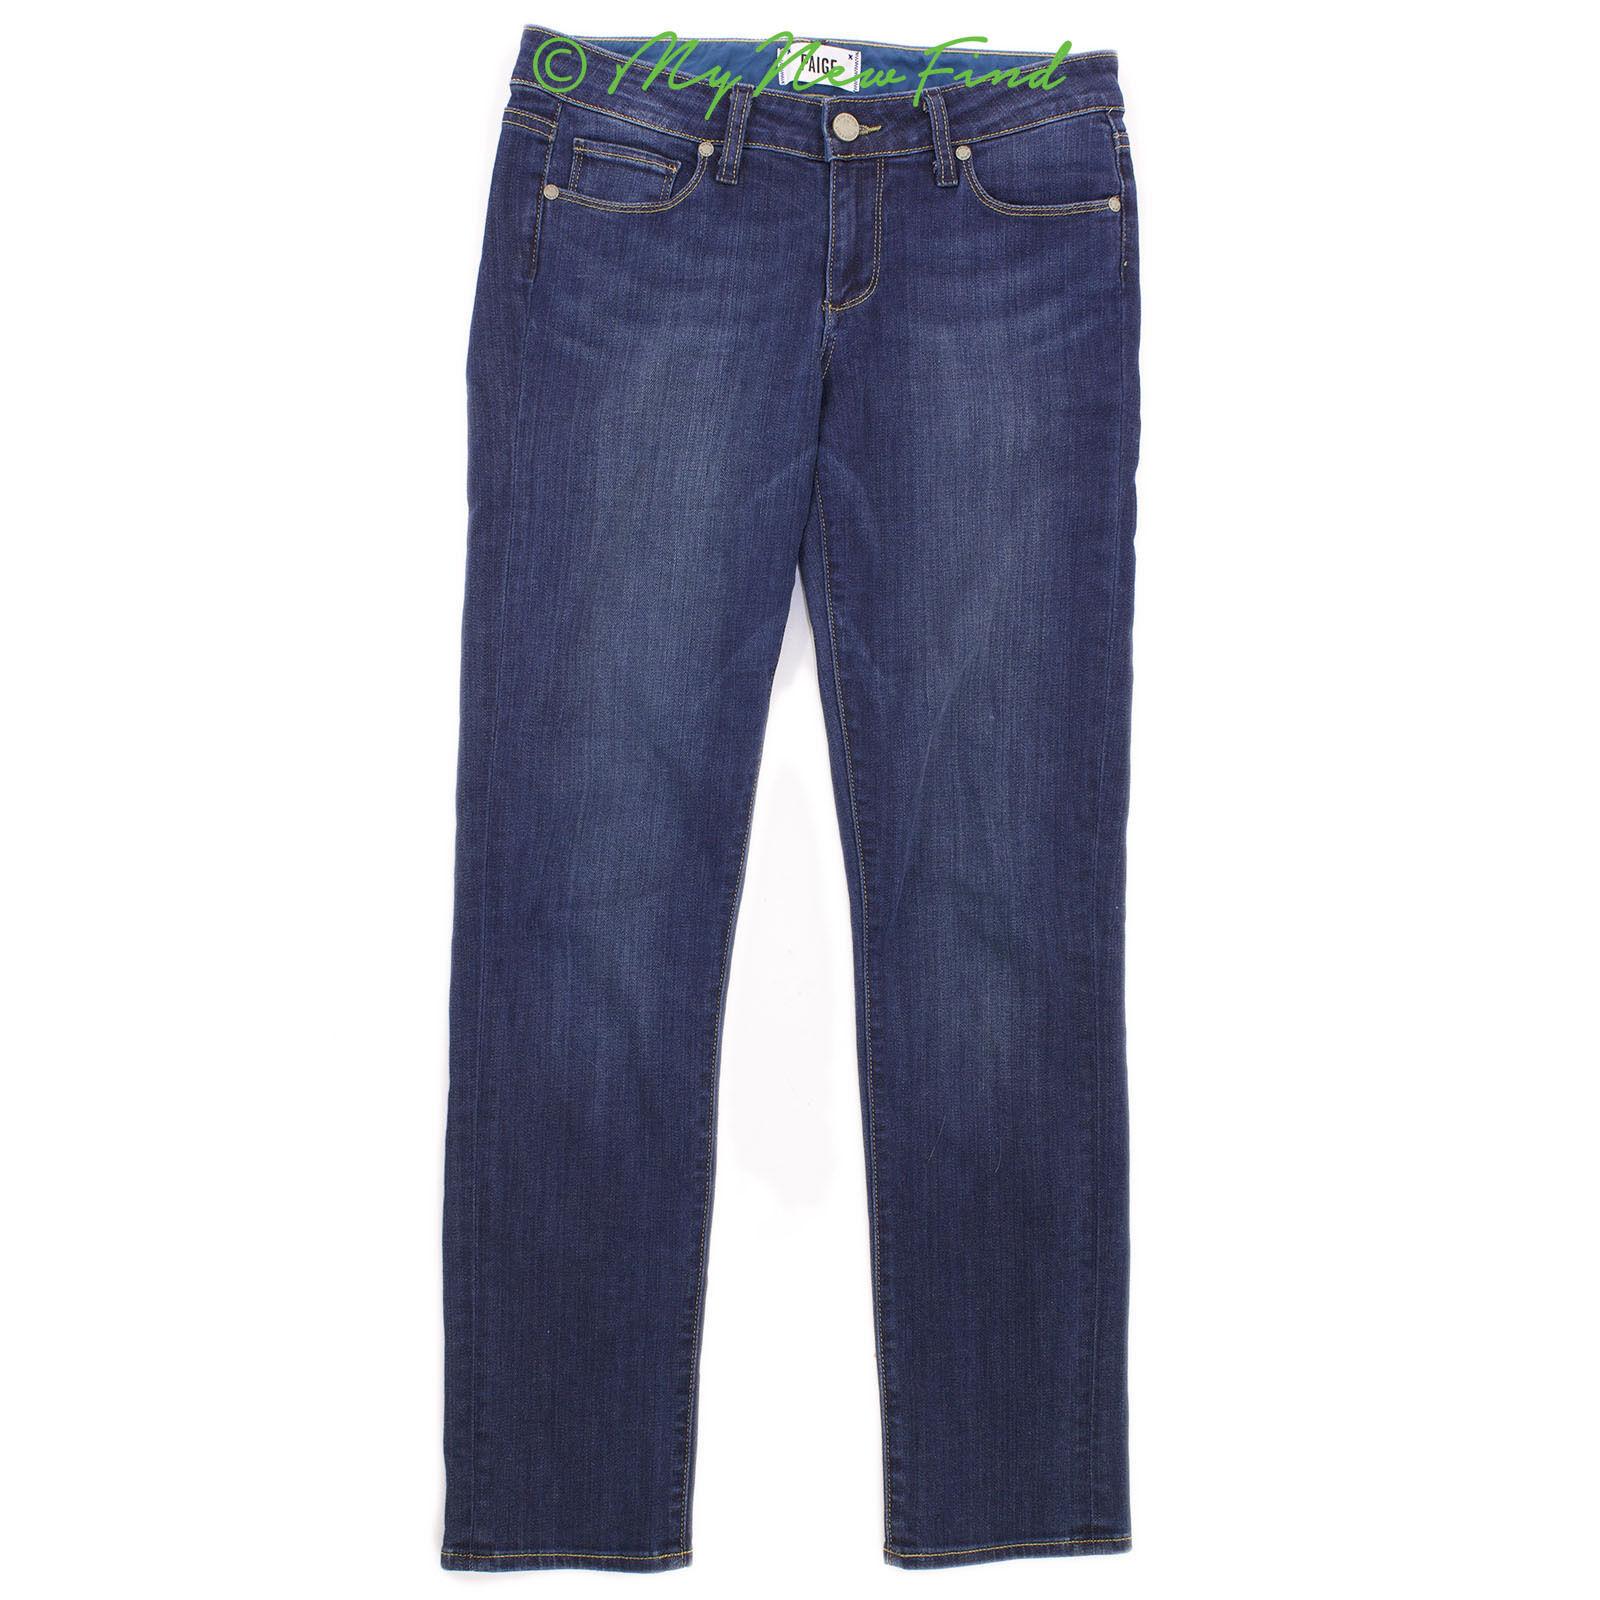 Paige Denim Hoxton Jeans Size 27 Ultra Skinny Skyline Ankle Peg Dark bluee  B41